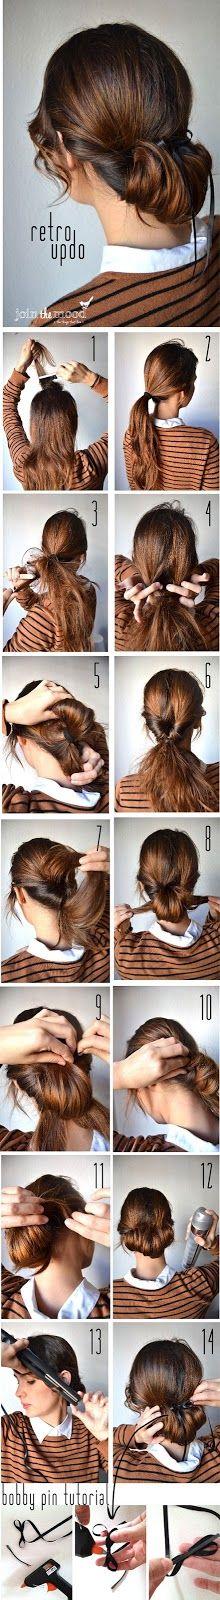 #DIY #hair Make A Retro UpDo